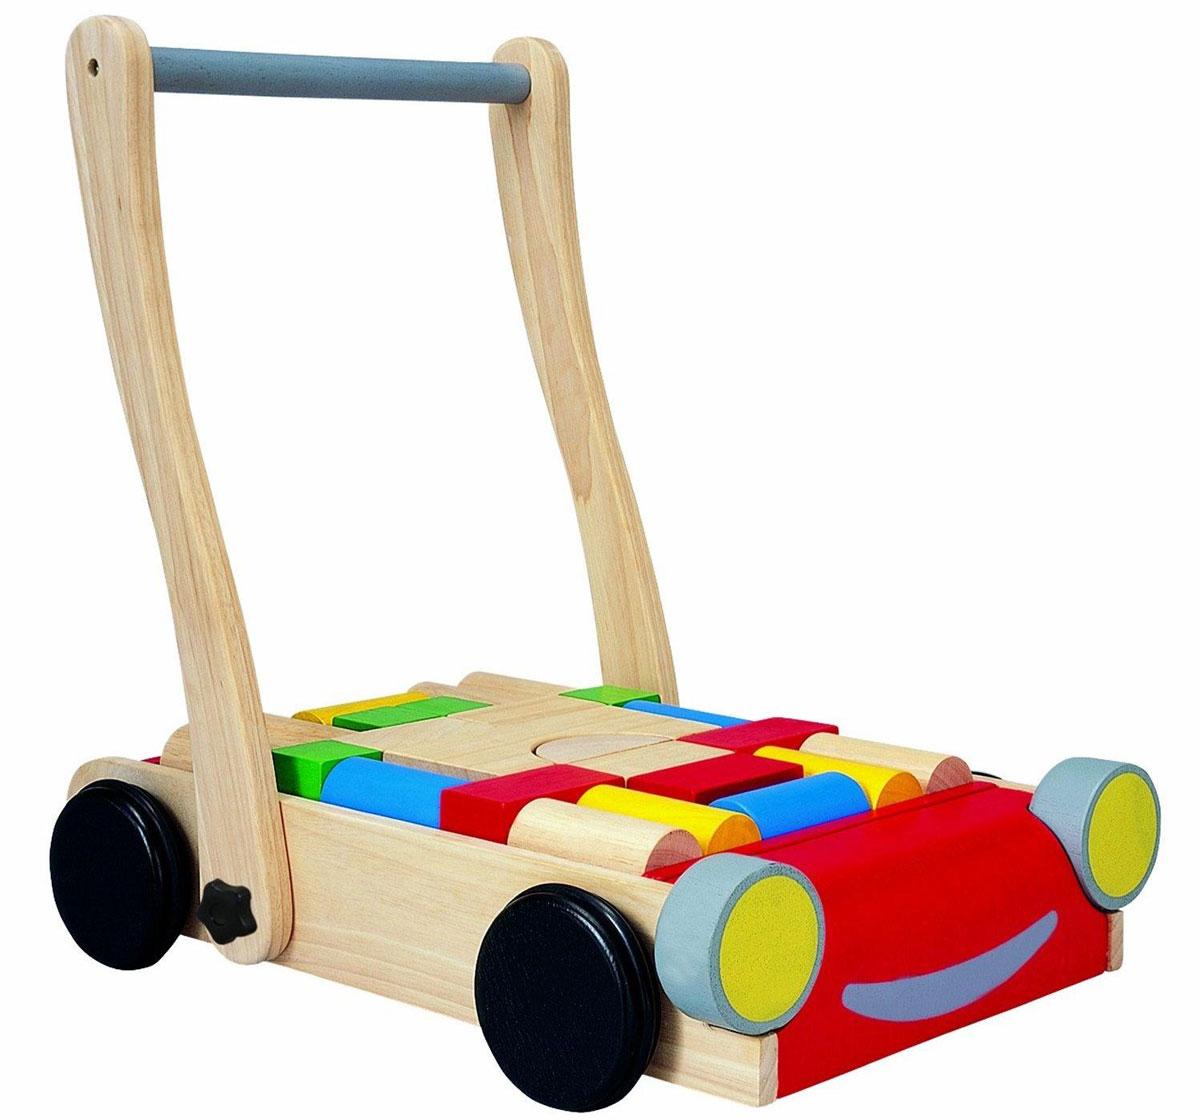 Plan Toys Конструктор Тележка с блоками конструкторы plan toys конструктор блоки